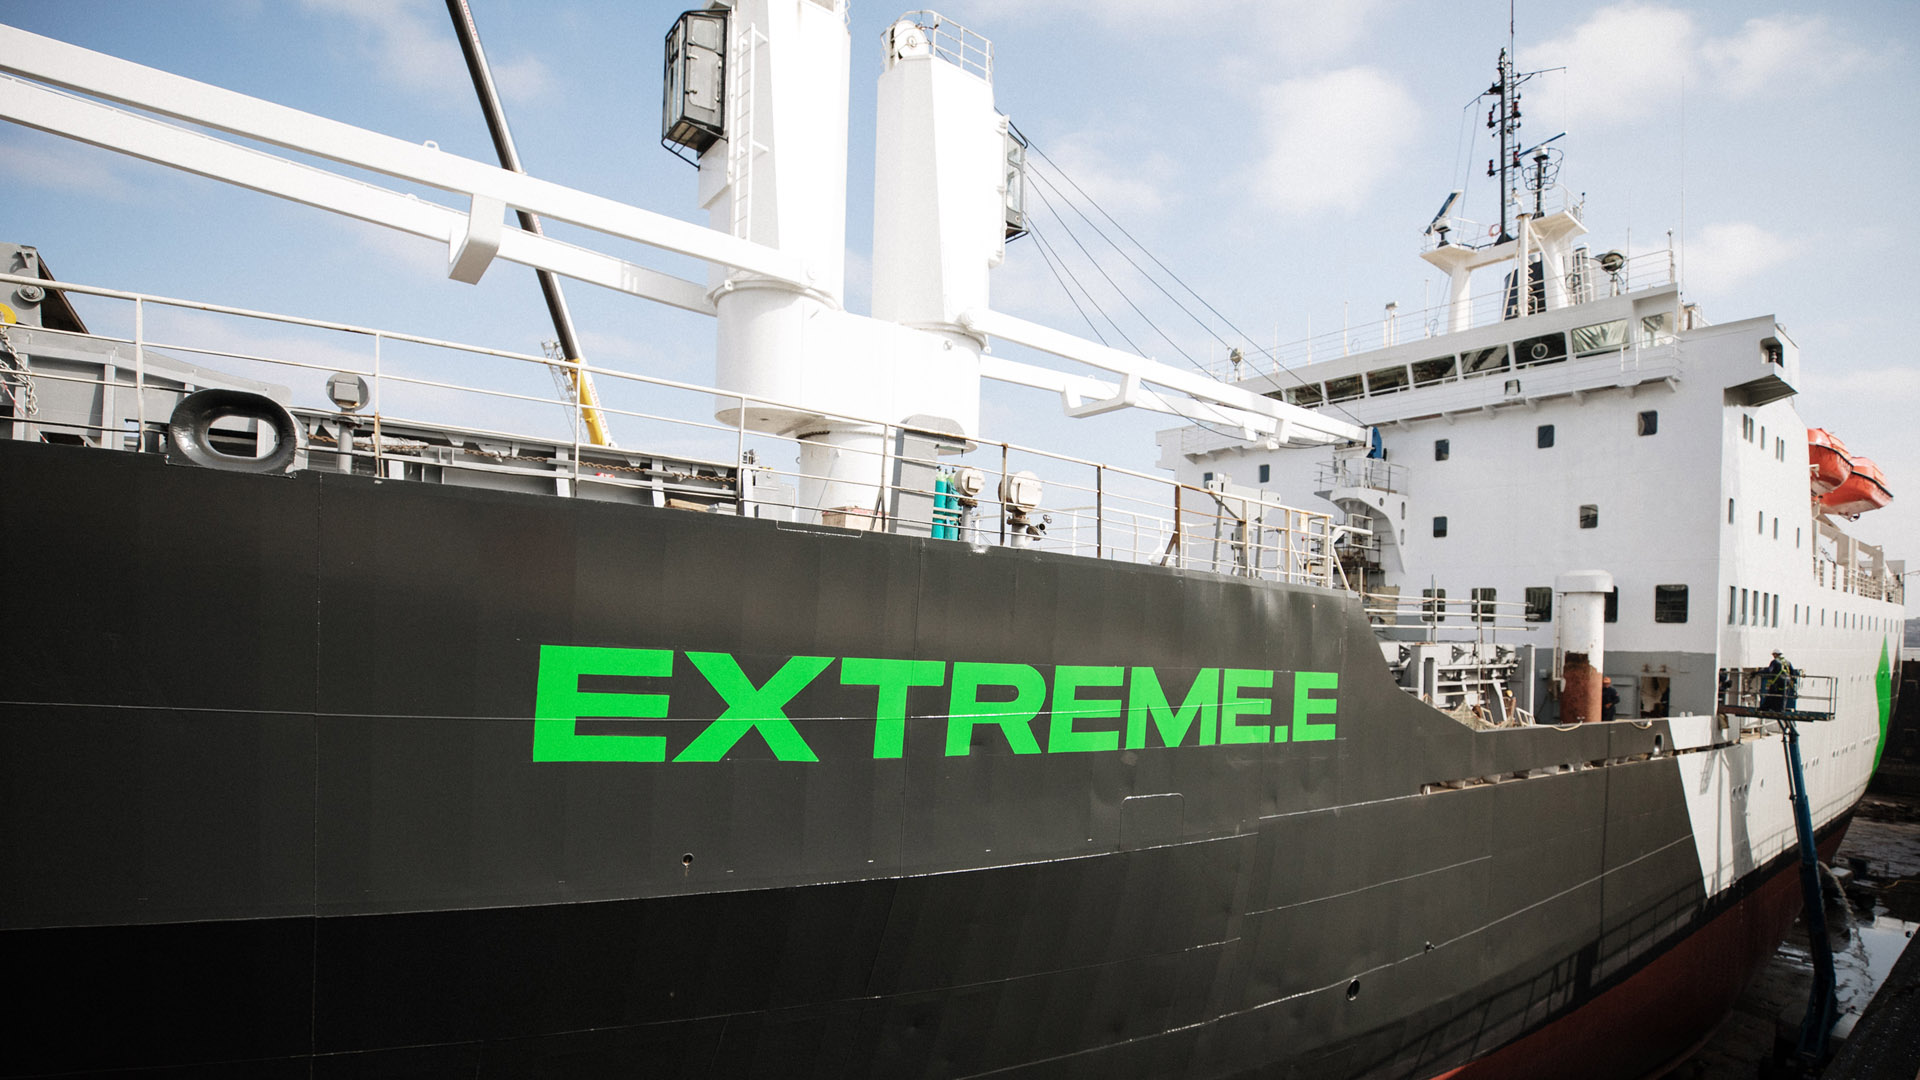 Extreme E St Helena boat